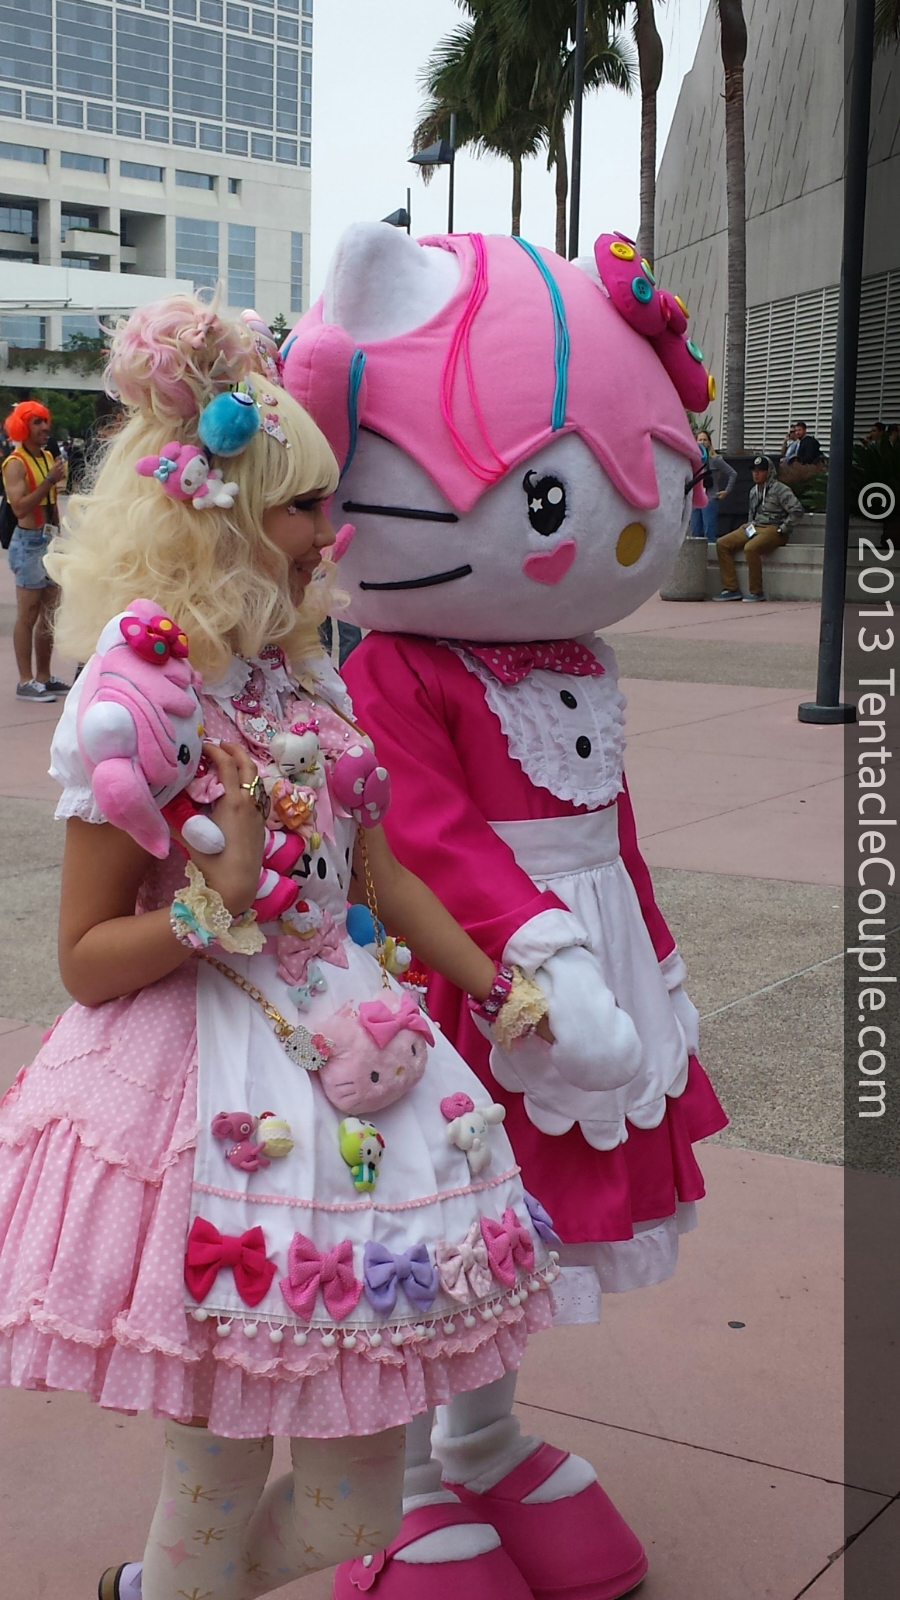 San Diego Comic-Con 2013 - Too Sweet!